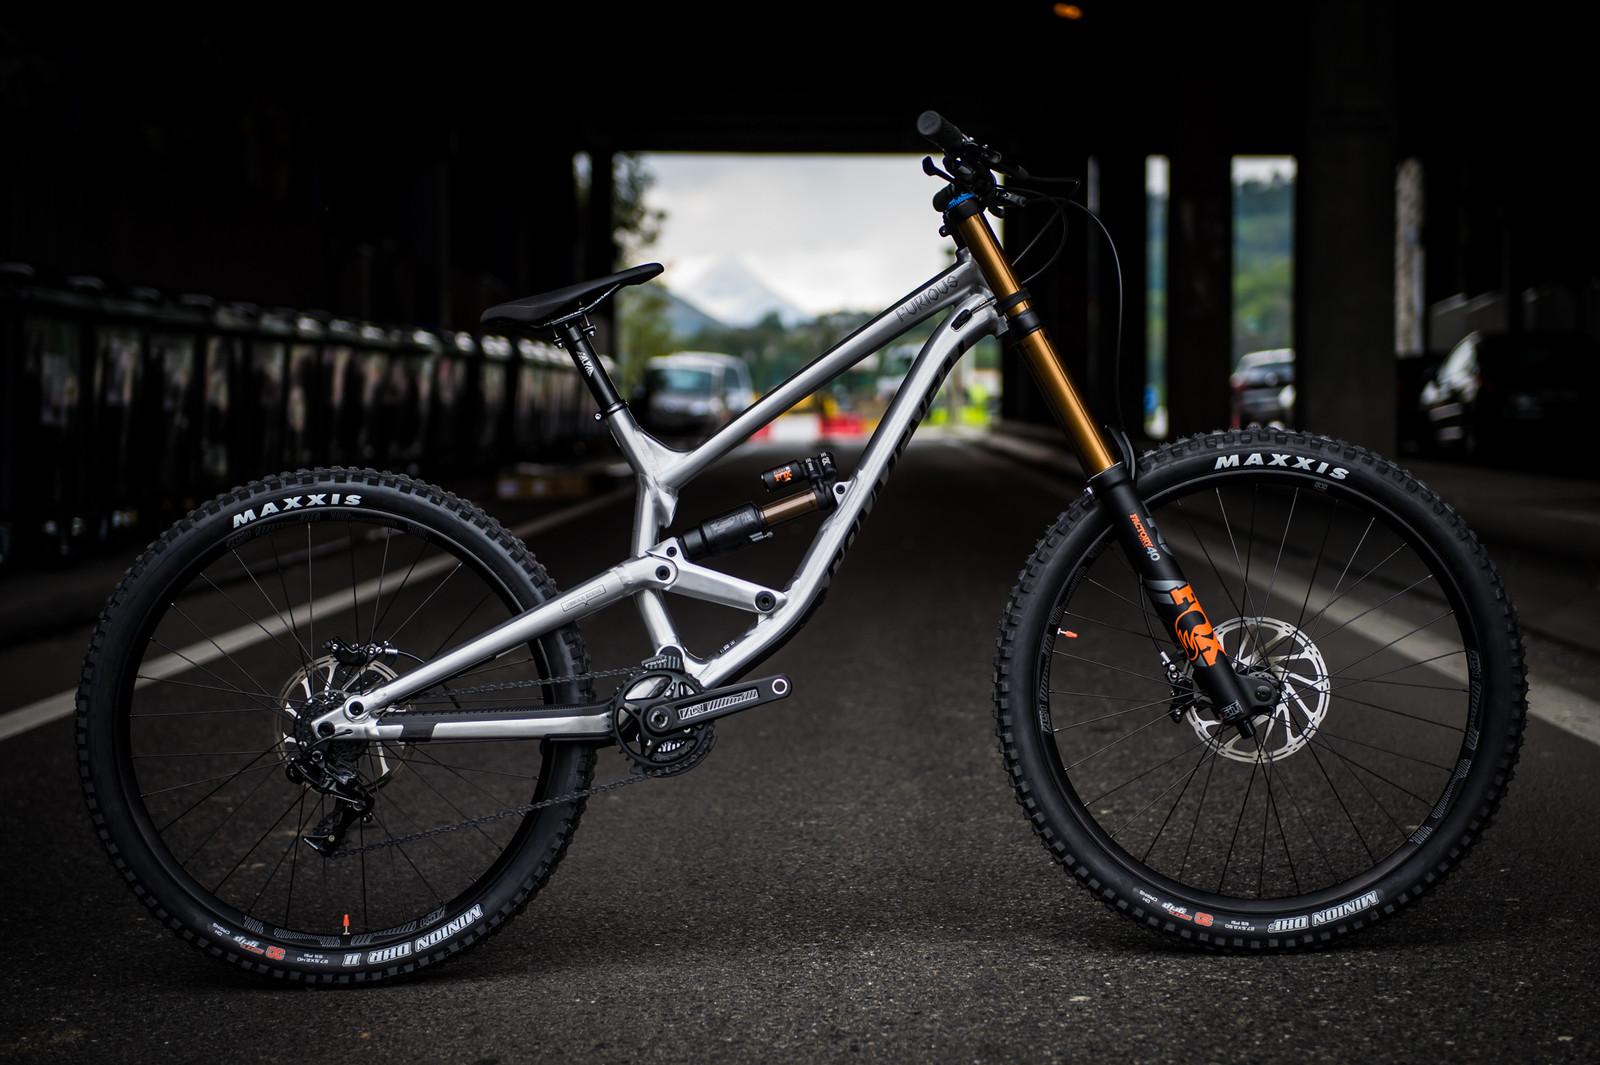 Commencal Furious 2018 - 2017 Lourdes World Cup Pit Bits - Mountain Biking Pictures - Vital MTB